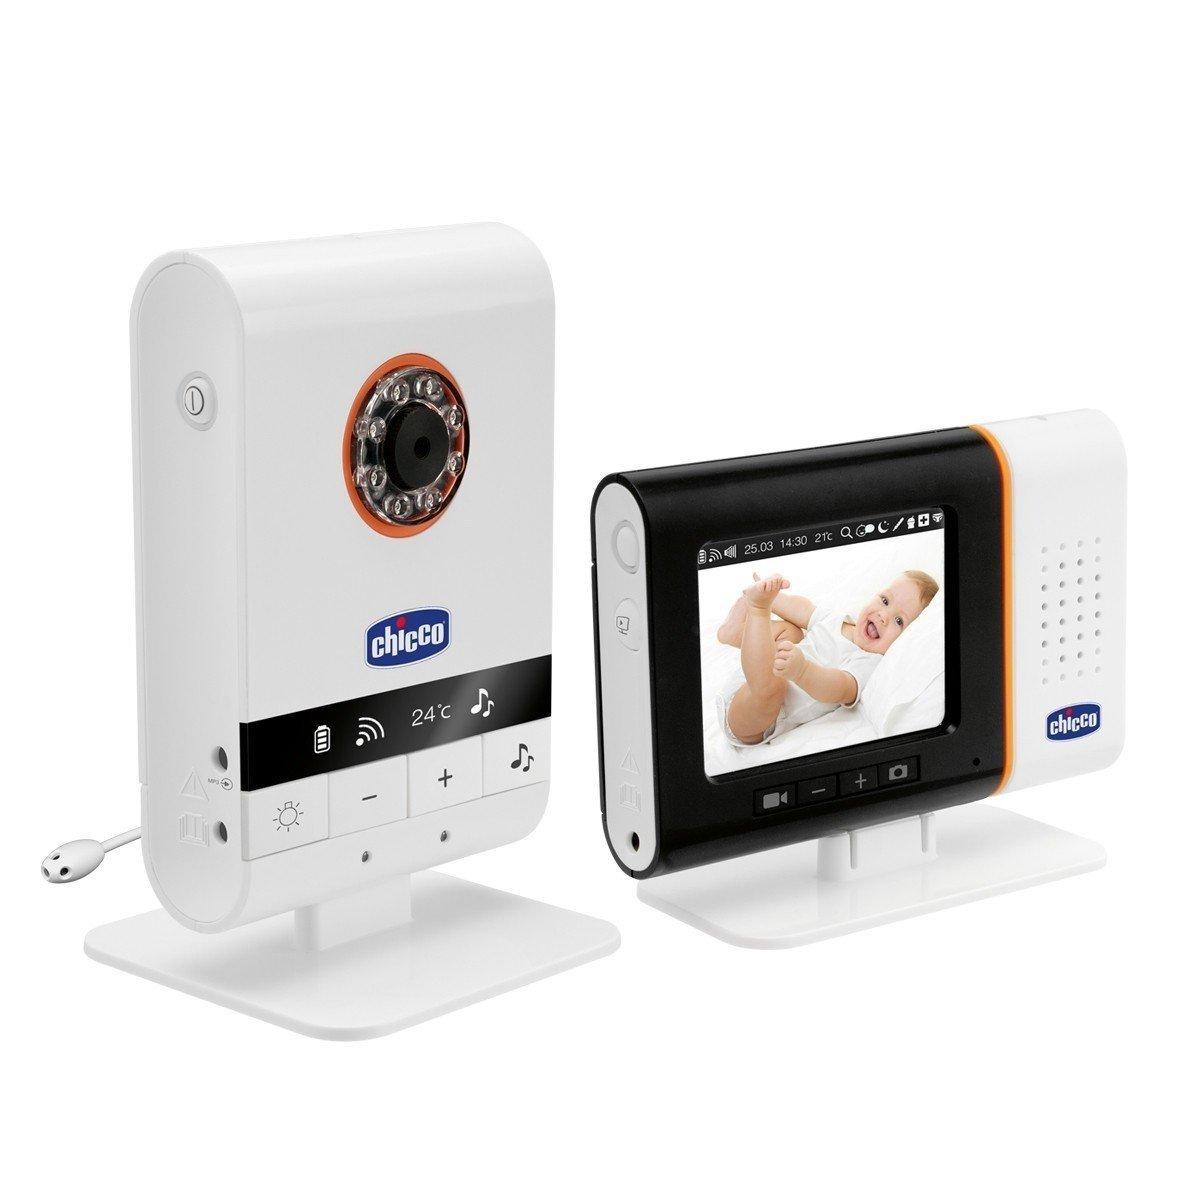 Видеоняня Chicco Baby monitor top digital video (02567.10) фото 1